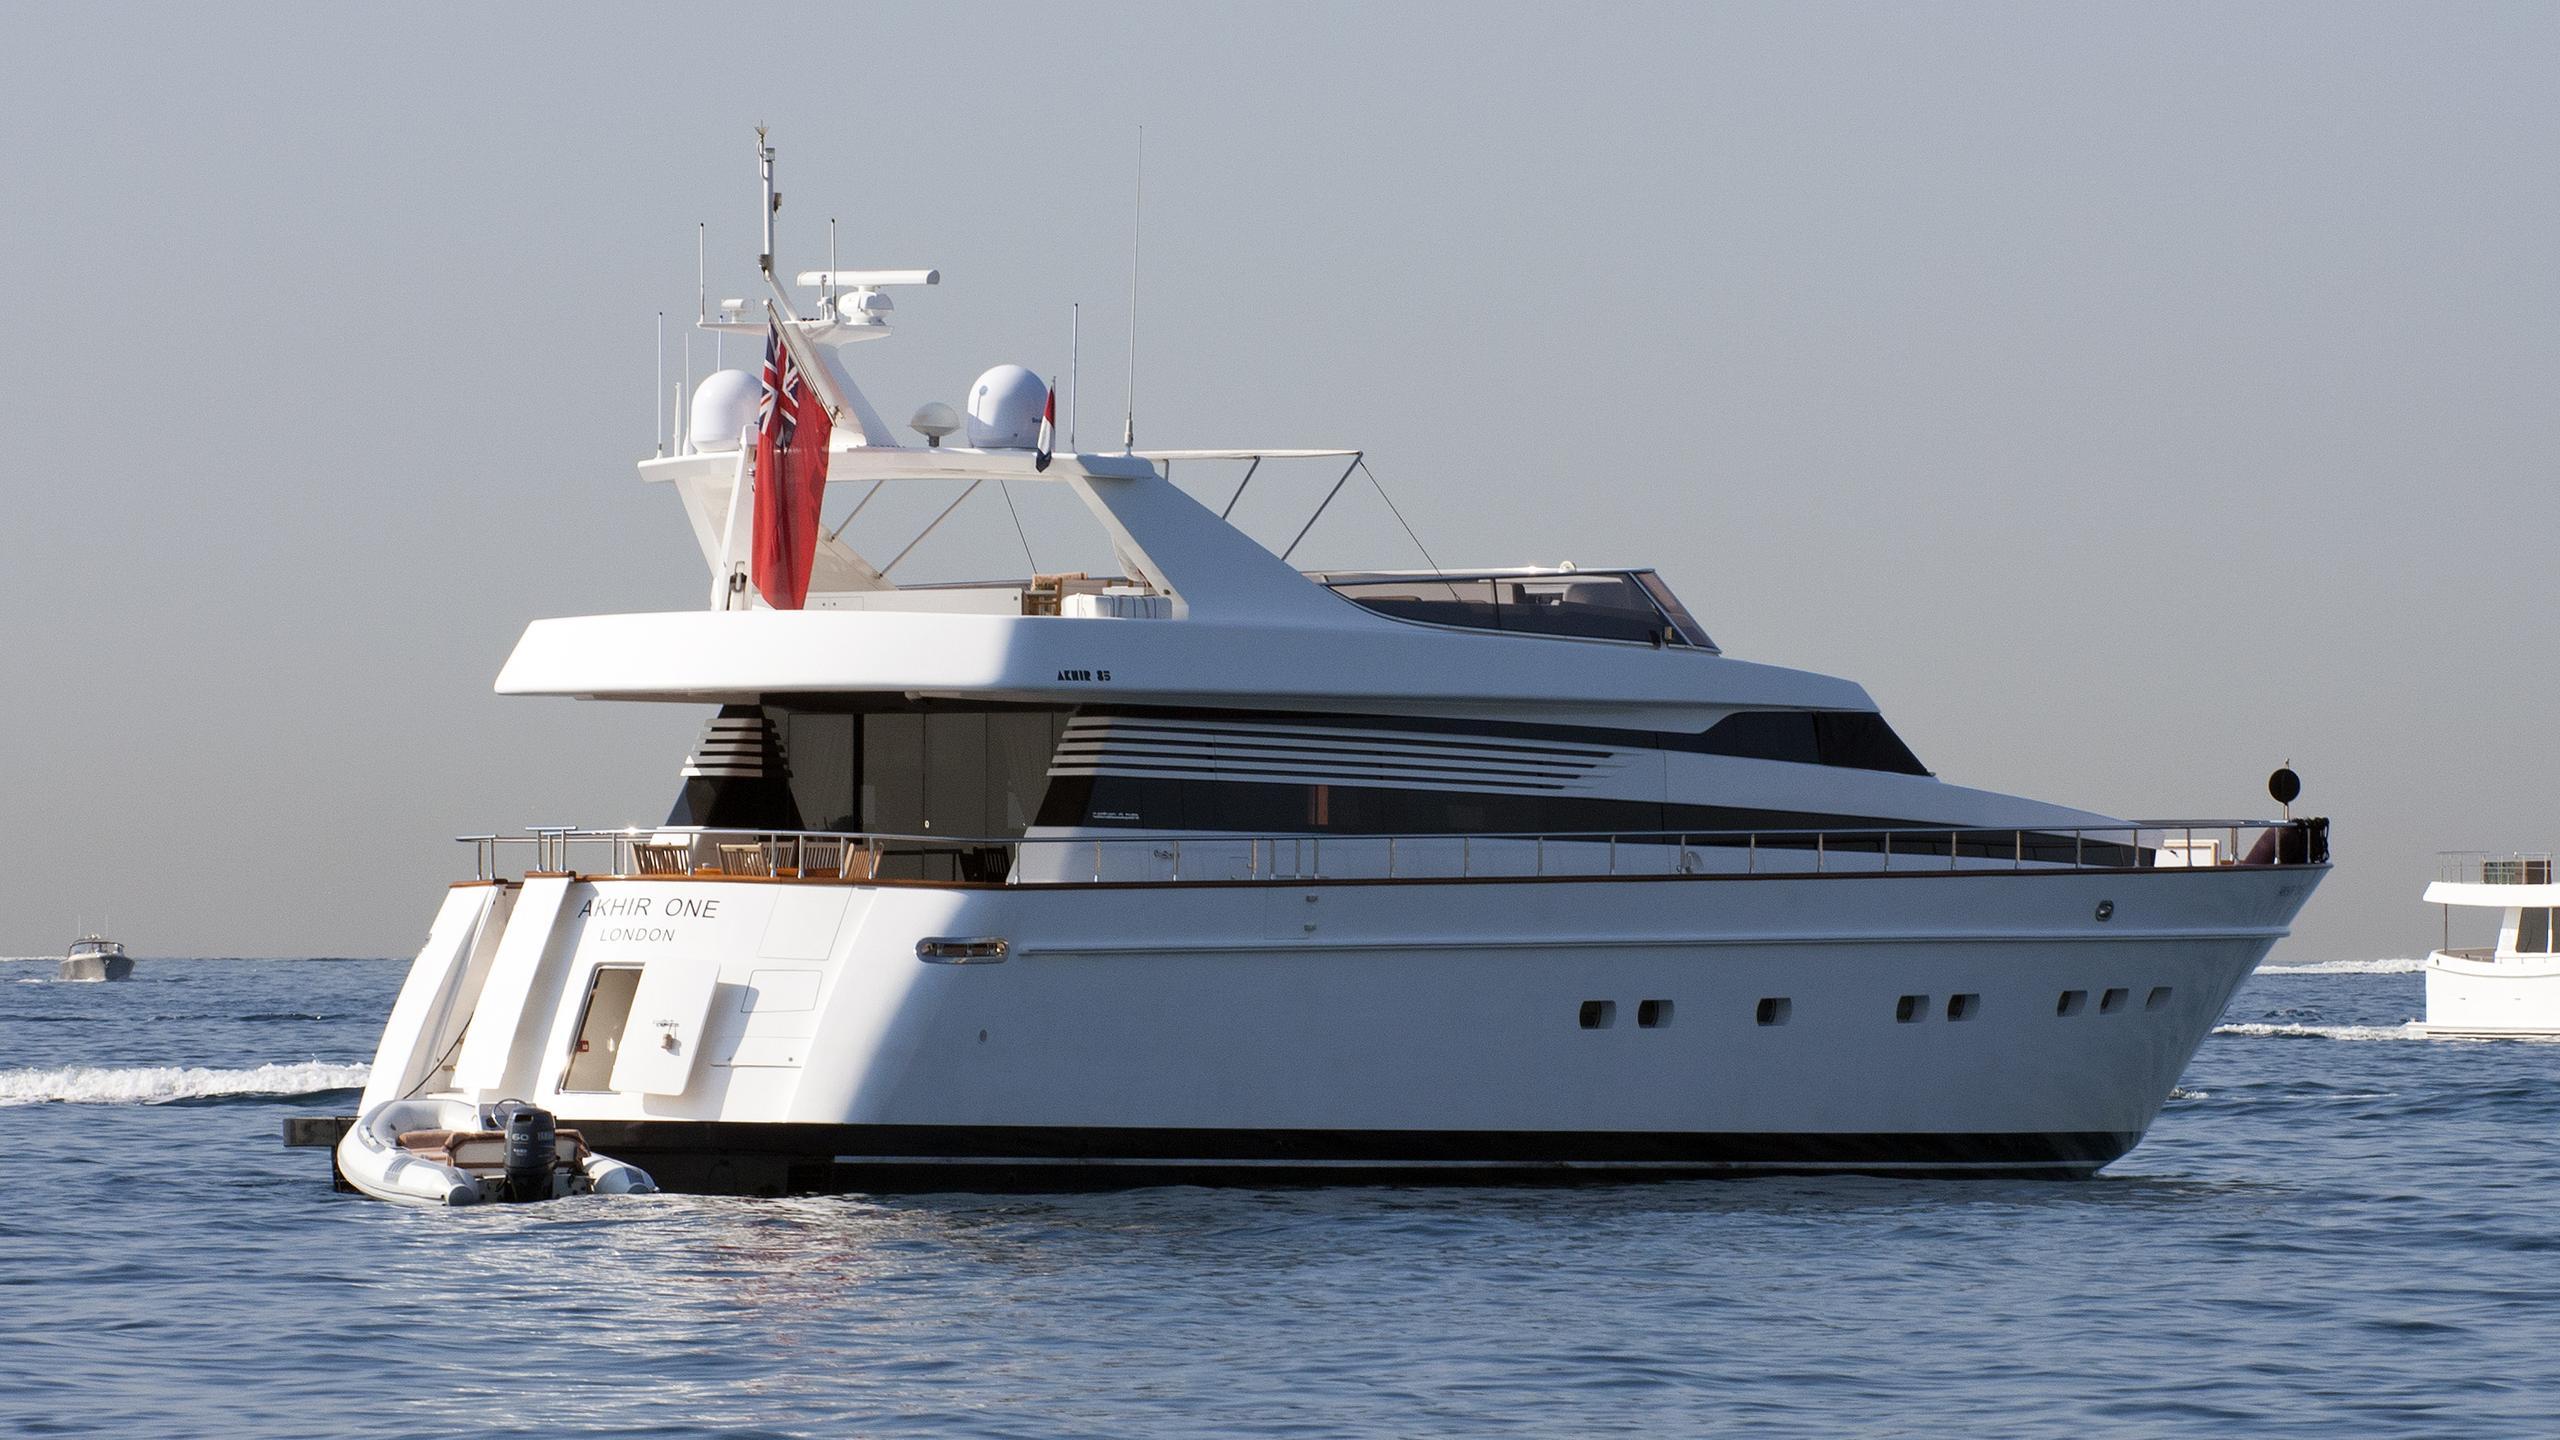 akhir-one-265-motor-yacht-cantieri-di-pisa-2007-26m-rear-profile